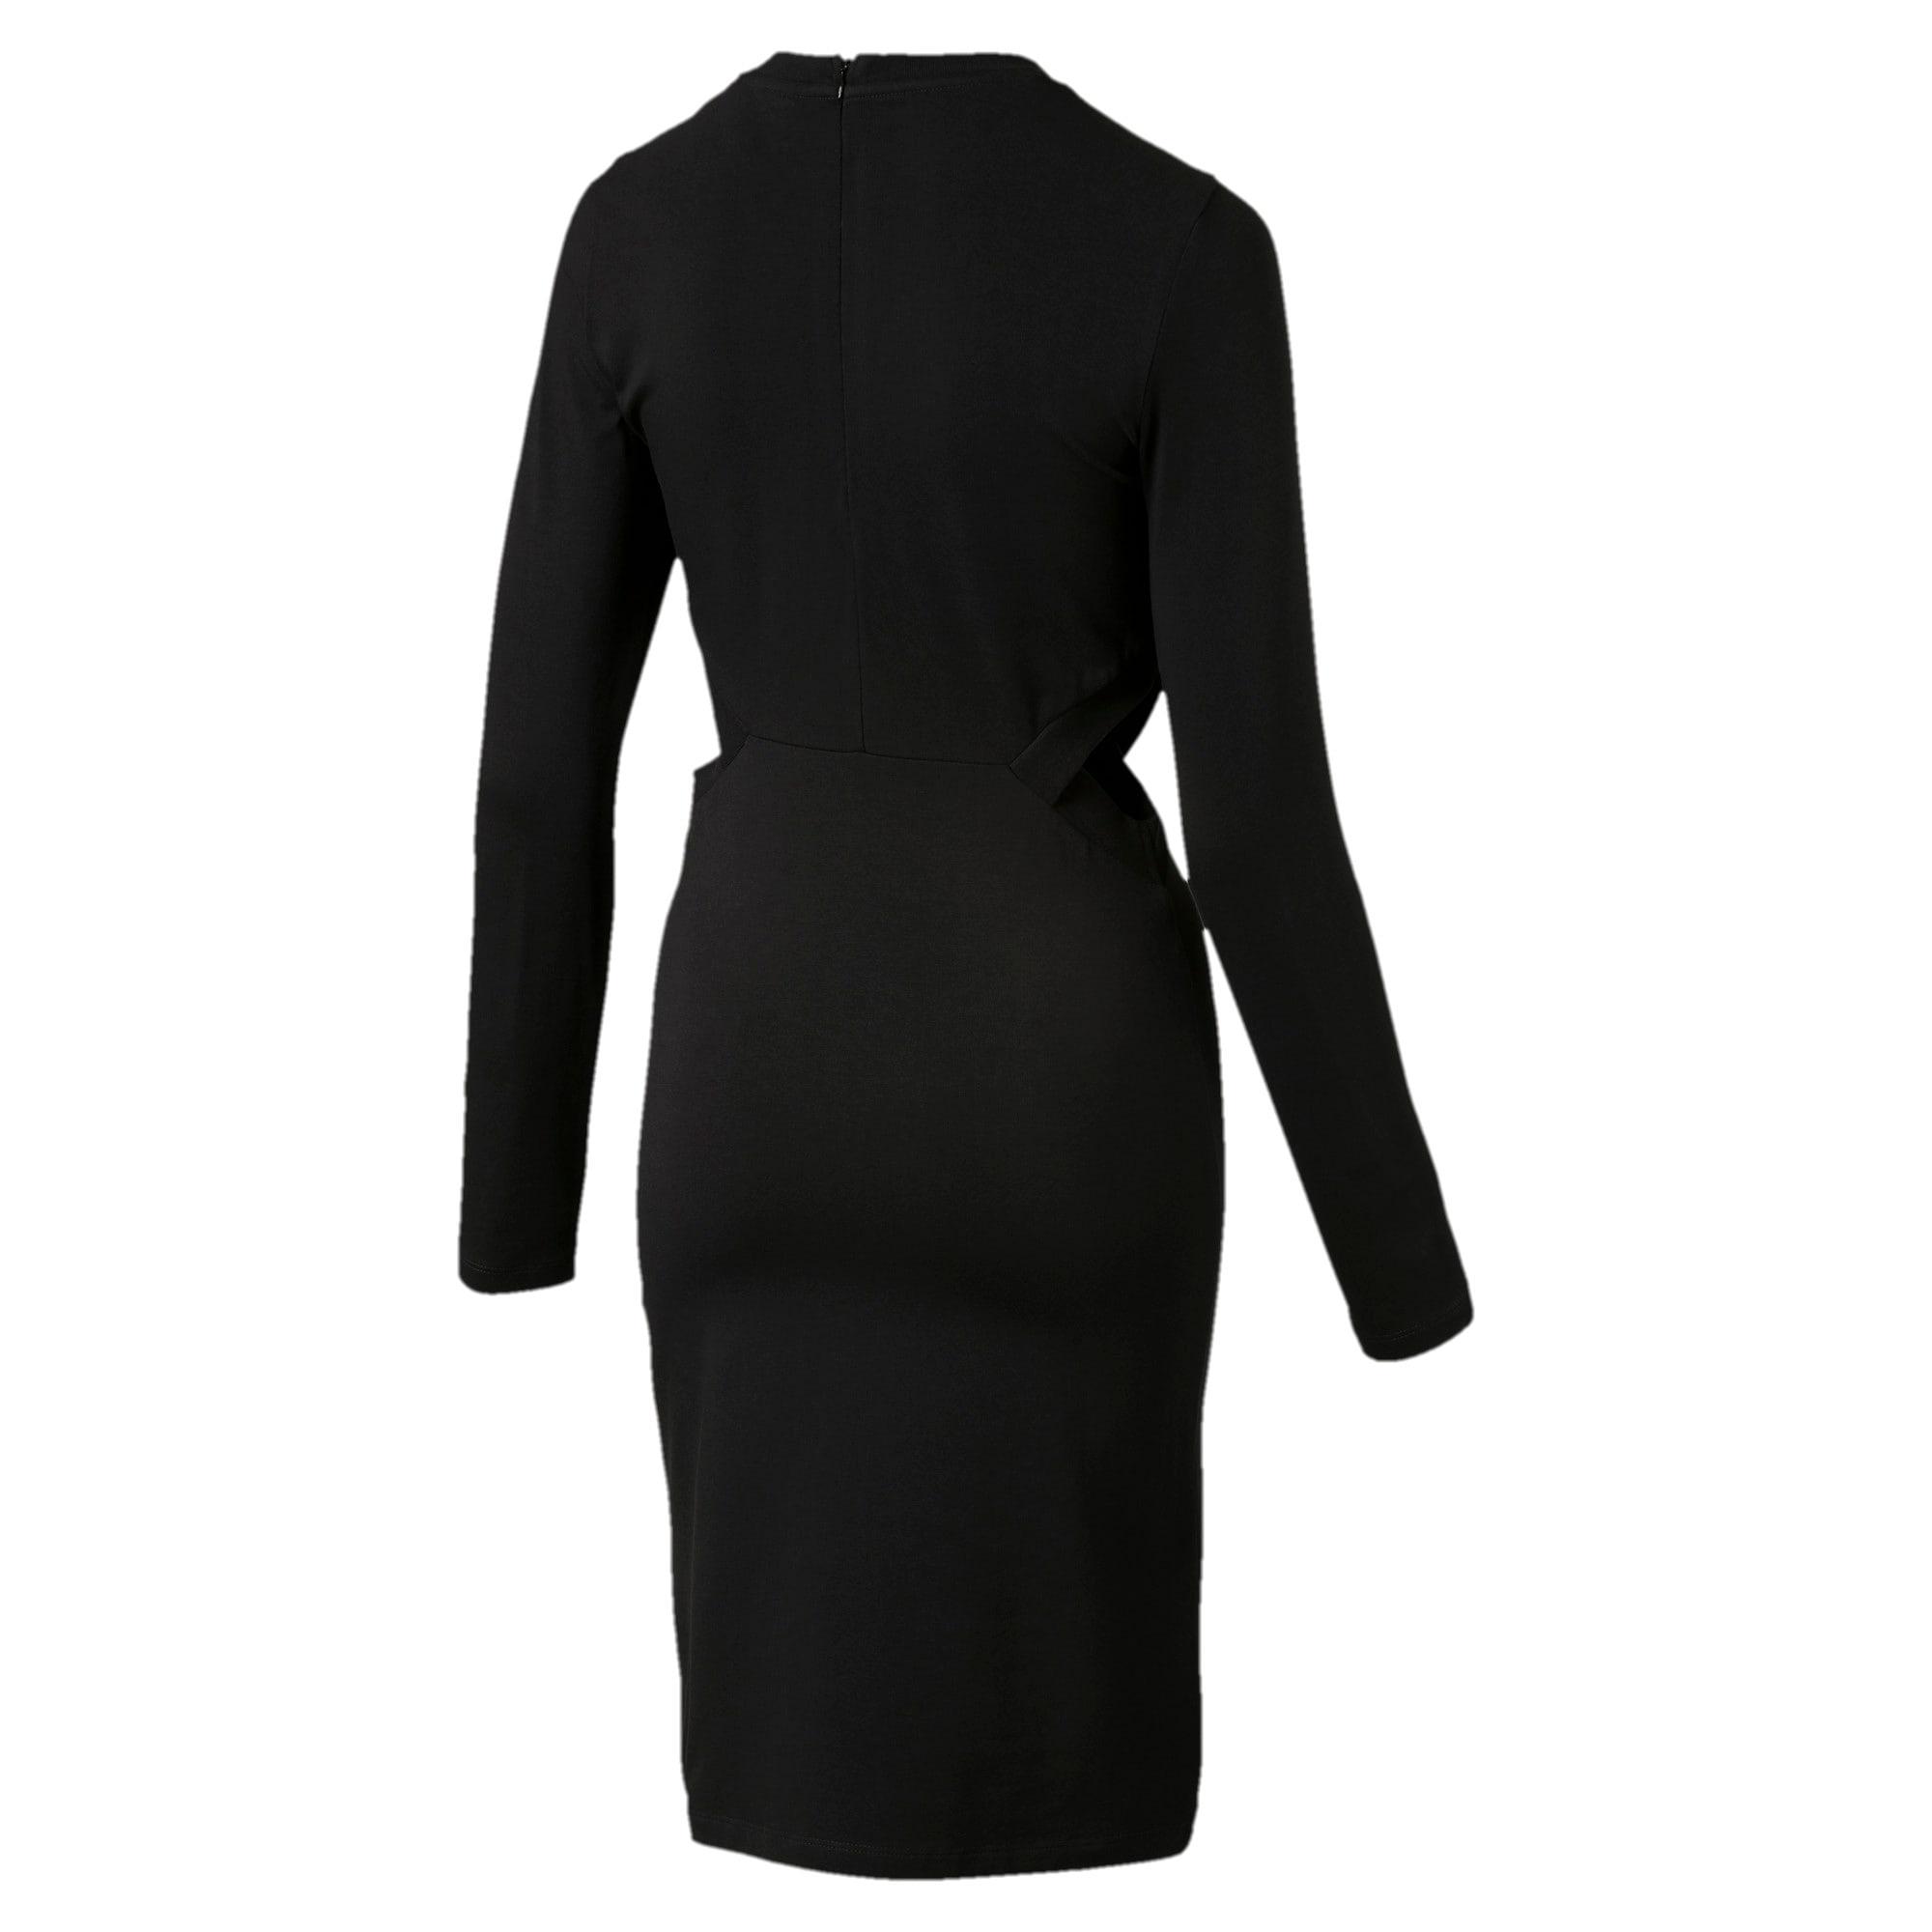 Thumbnail 3 of Classics Logo Women's Tight Dress, Cotton Black, medium